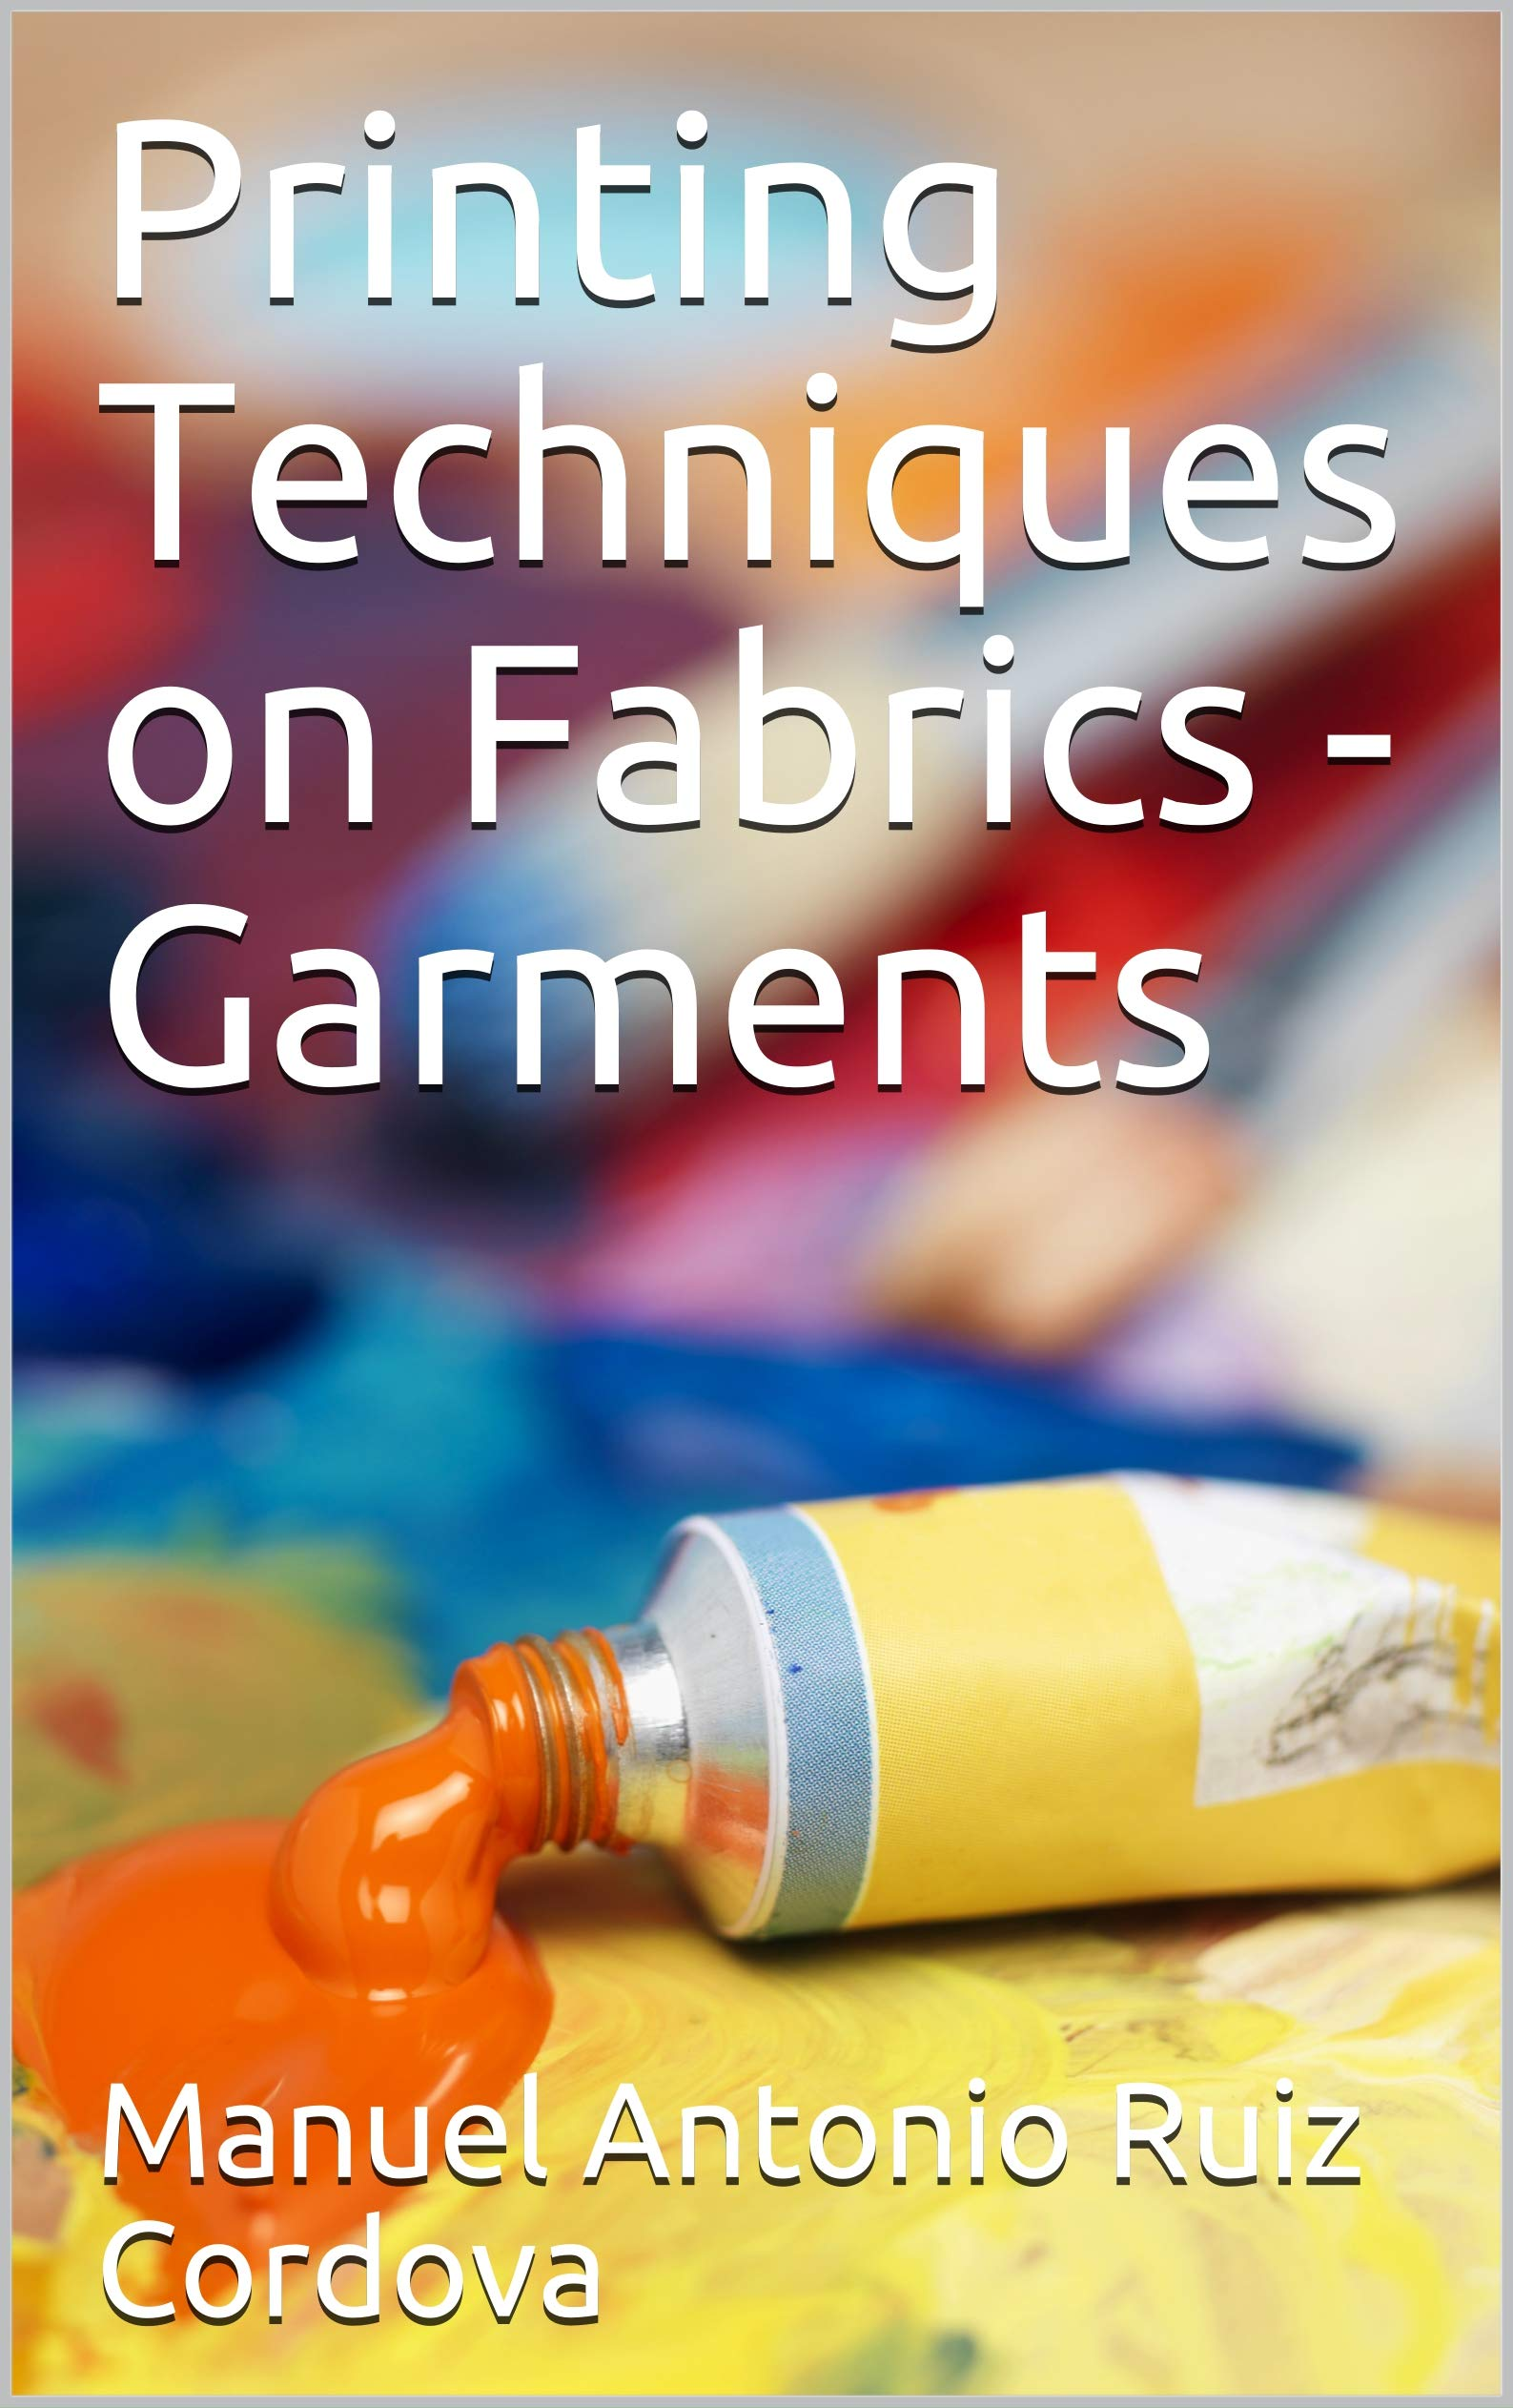 Printing Techniques on Fabrics - Garments